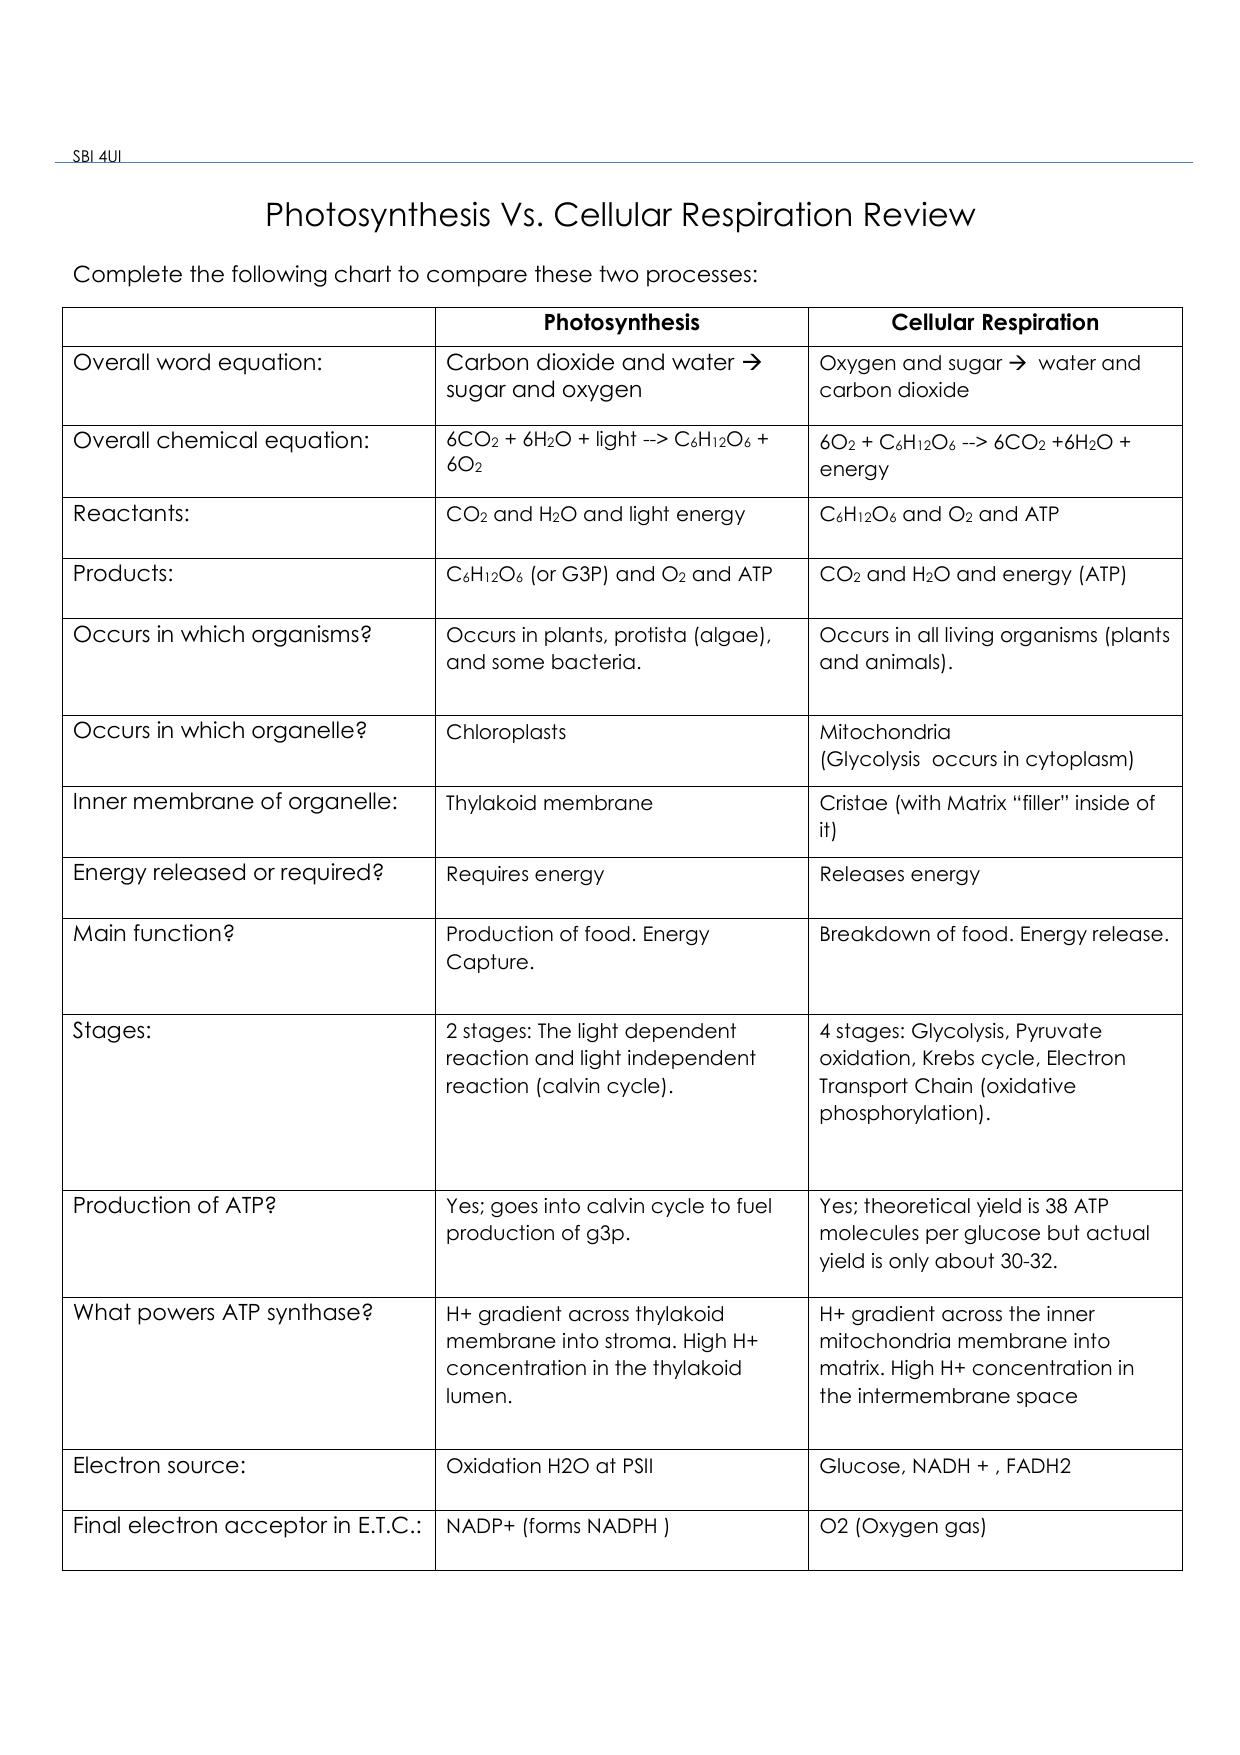 Cellular Respiration Worksheet Answer Key Lovely High